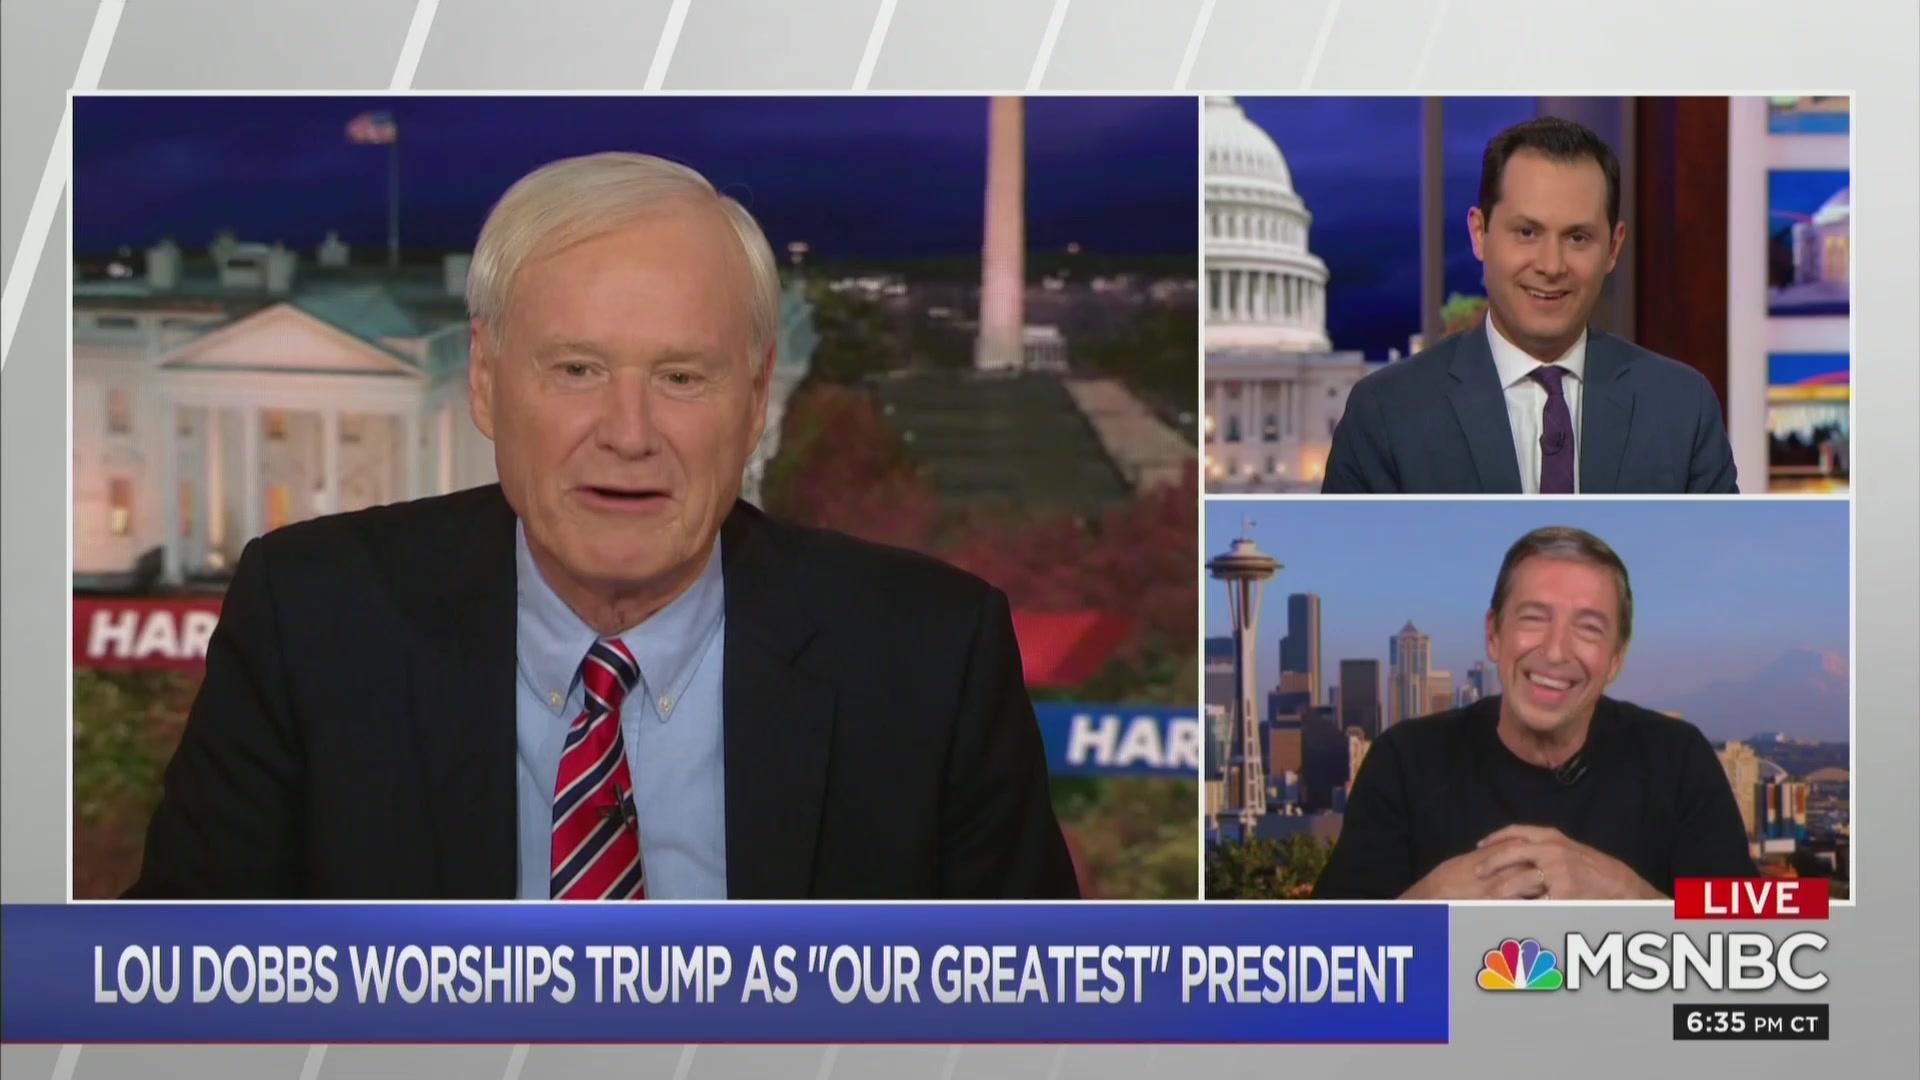 Chris Matthews Lampoons Lou Dobbs' Trump Commentary as 'North Korean State TV'